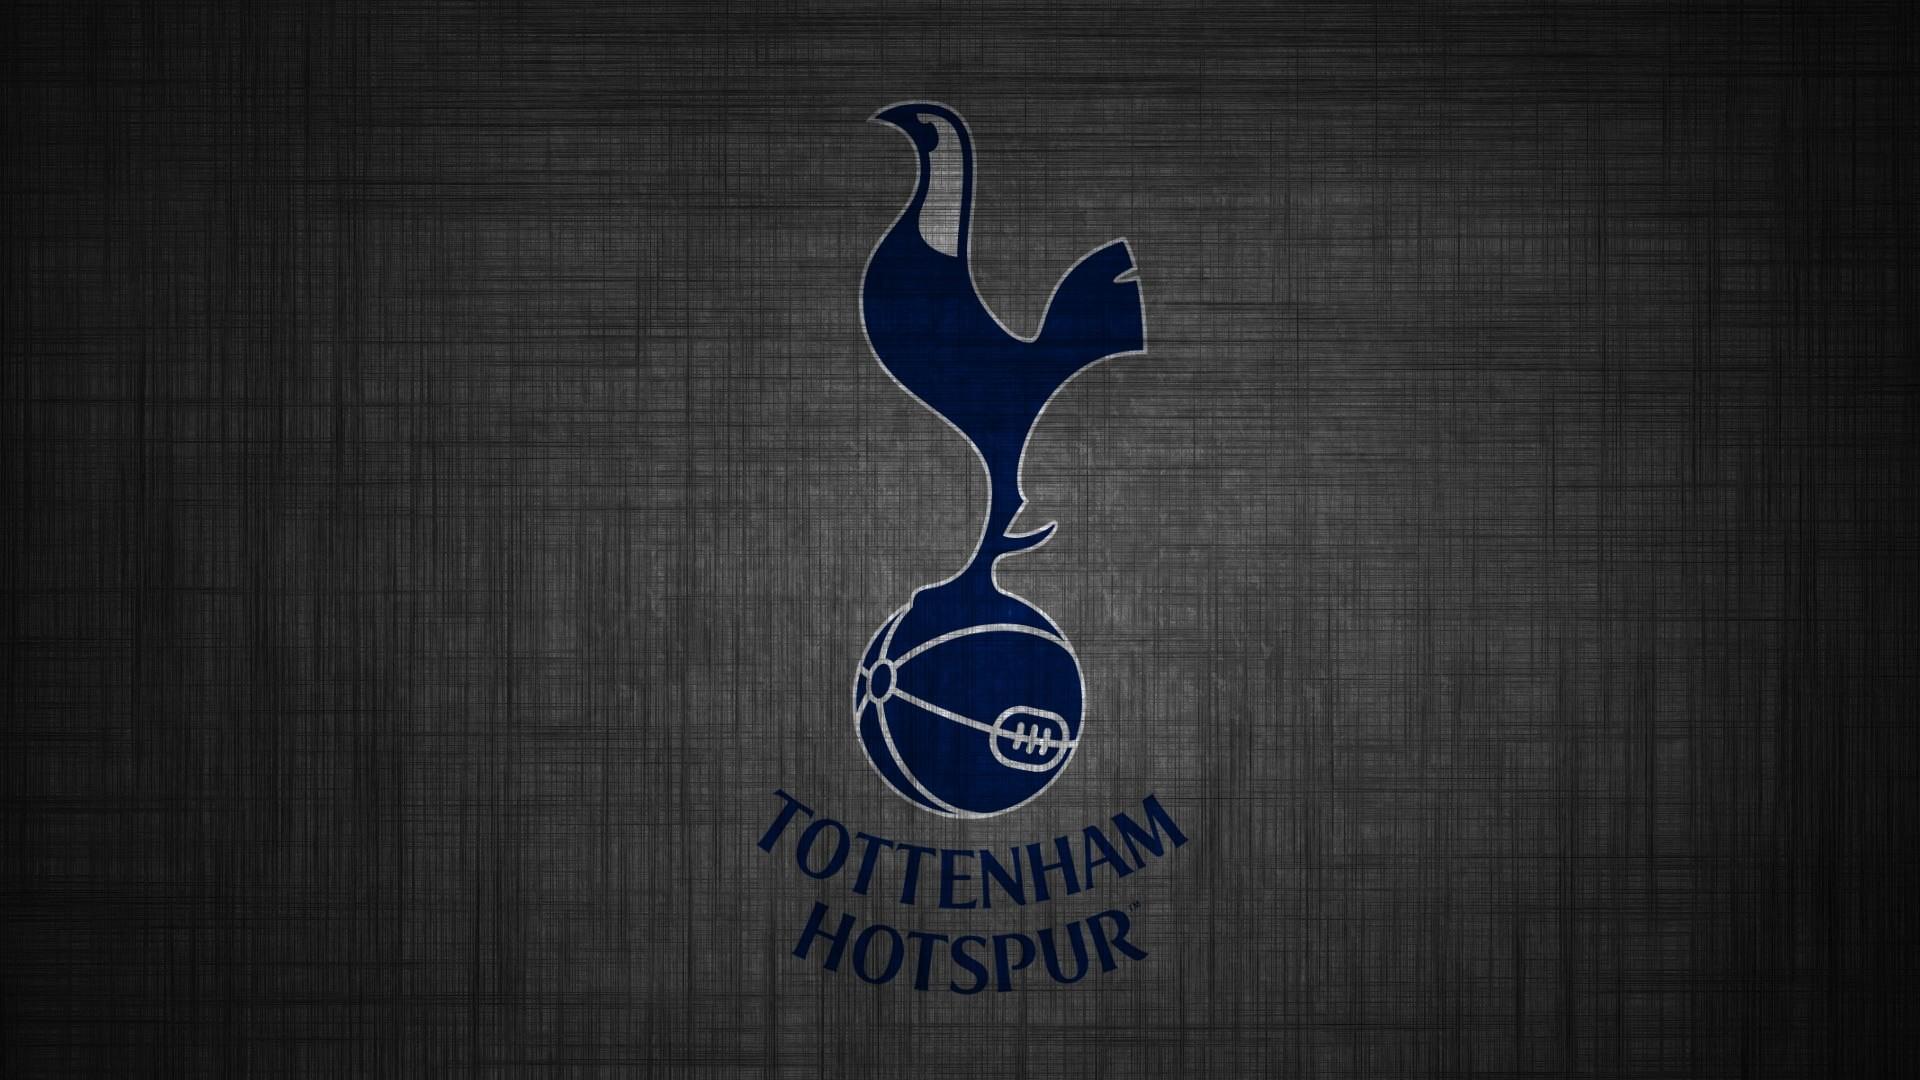 Tottenham: Tottenham Hotspur HD Wallpaper (74+ Images